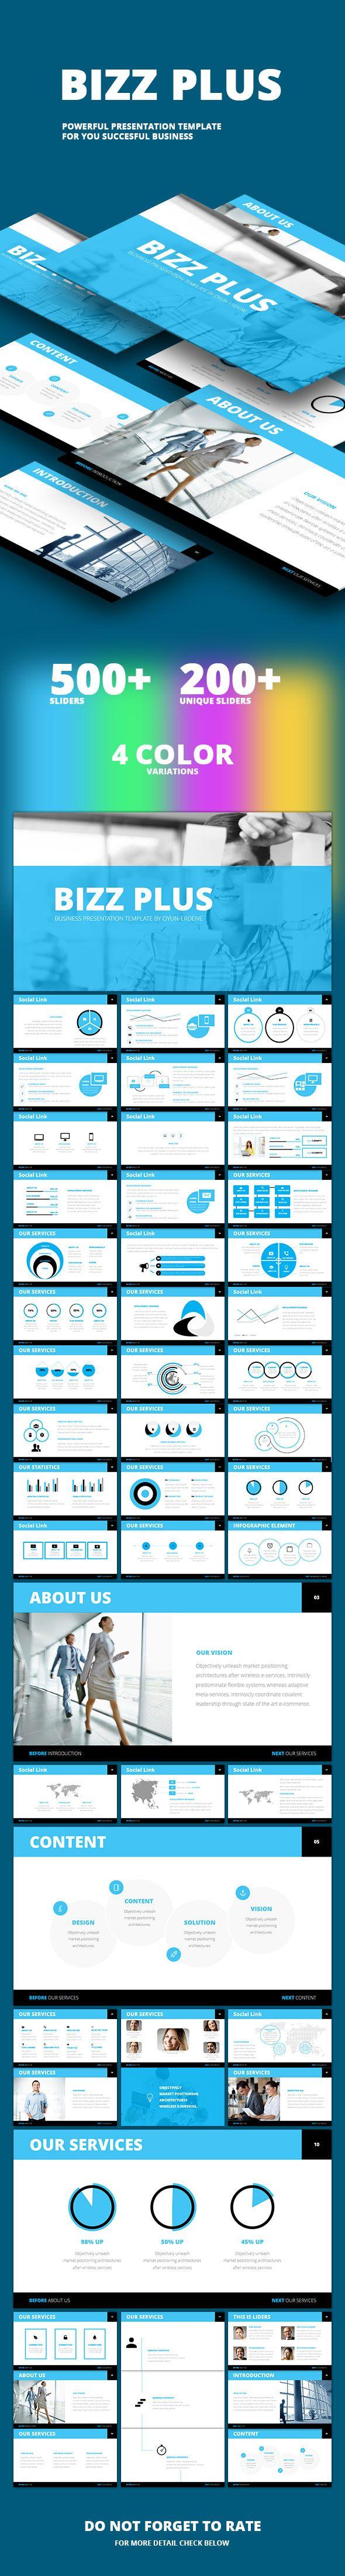 Bizz Plus - Business Presentation Template (Powerpoint Templates)